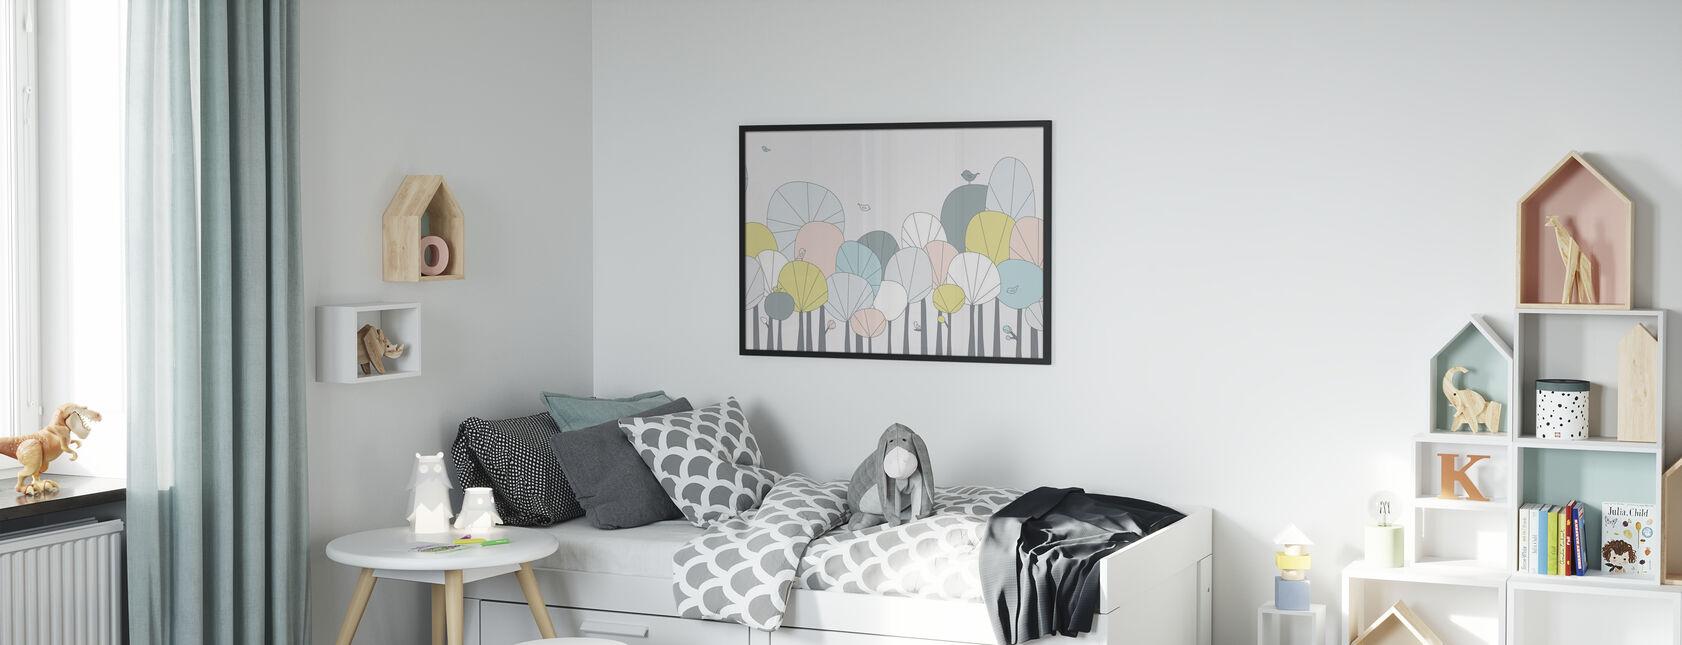 Happy Forest - Pastell - Innrammet bilde - Barnerom